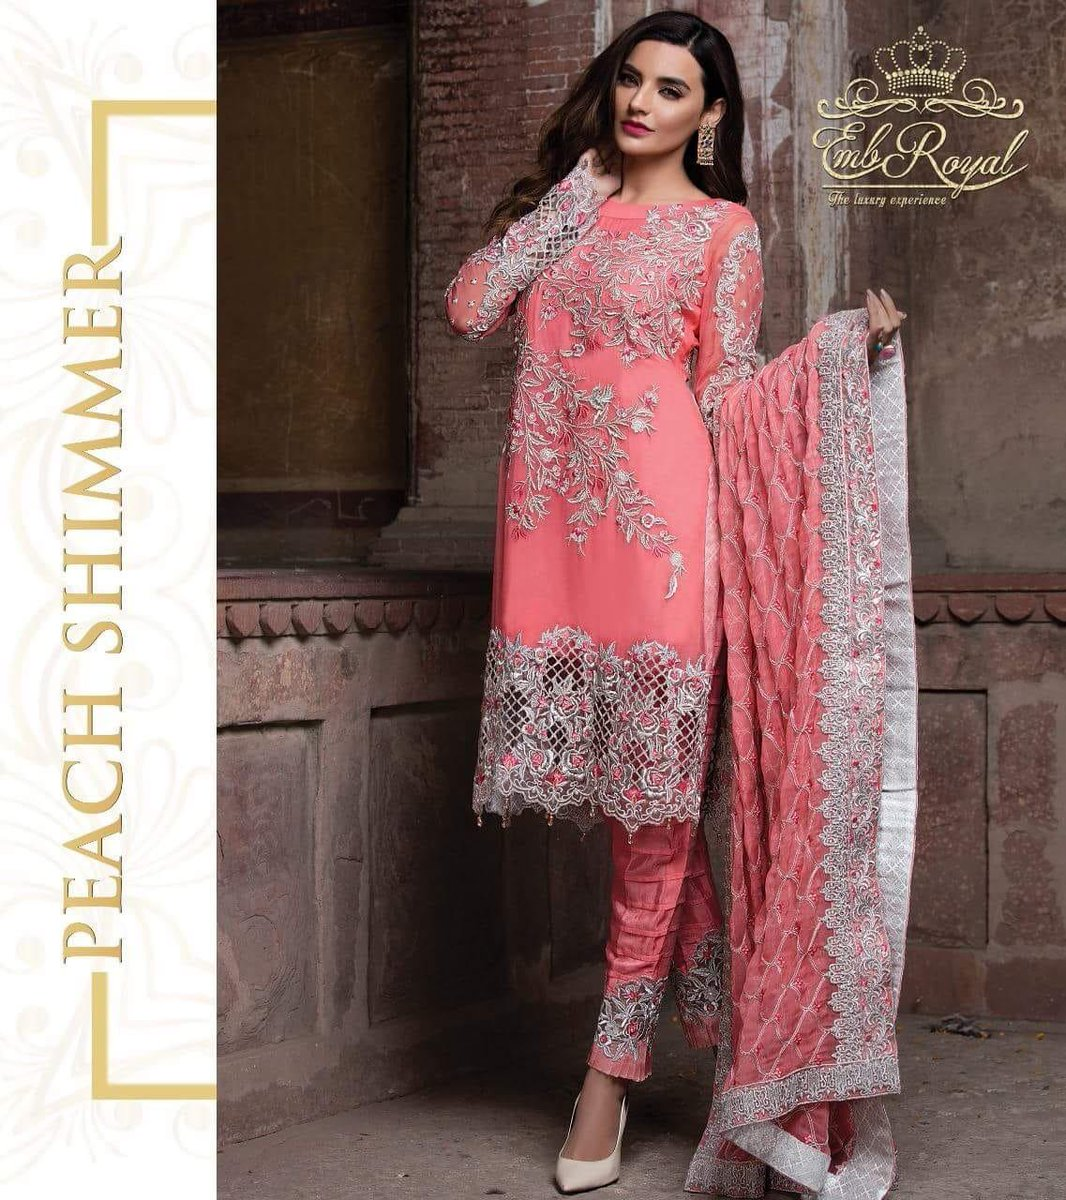 1e92d9dc3e ... Free Delivery In #Karachi More Info:  https://www.facebook.com/serenedesigns.pk/posts/2187227914647926 …  (#designerwear,#ladiesreplica,#fashion,#embroyal ...